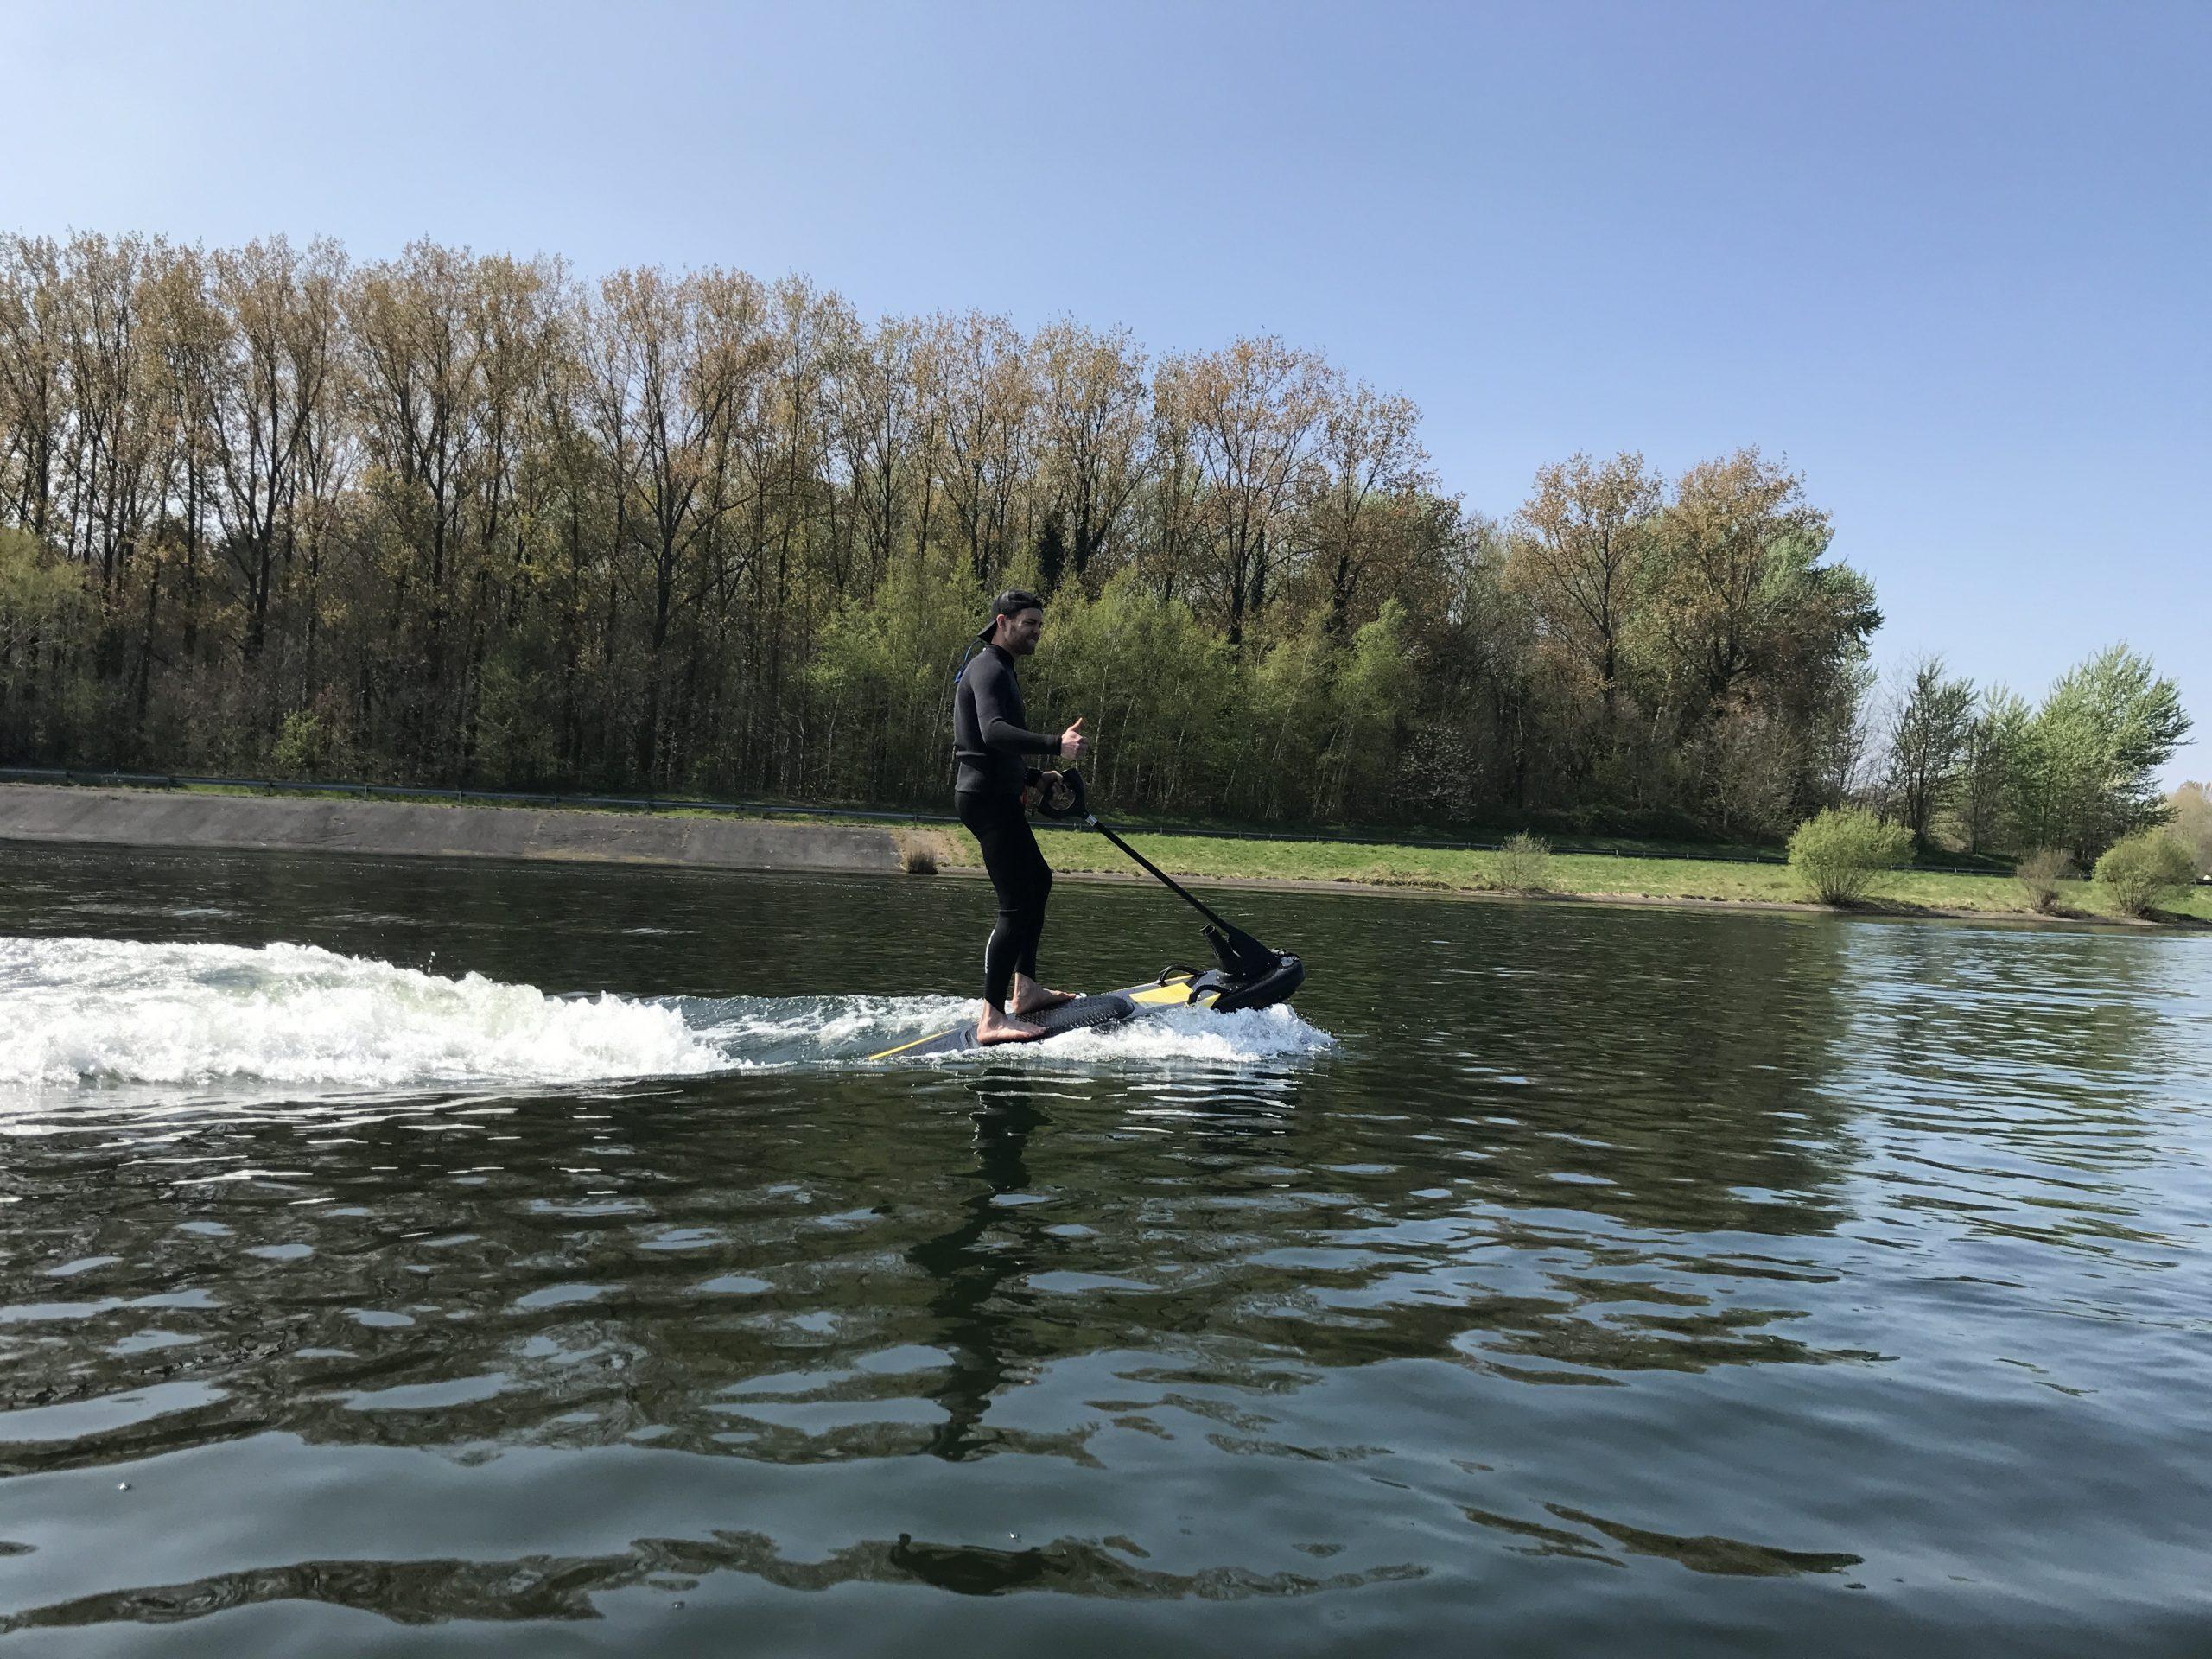 jetsurf-slide-4